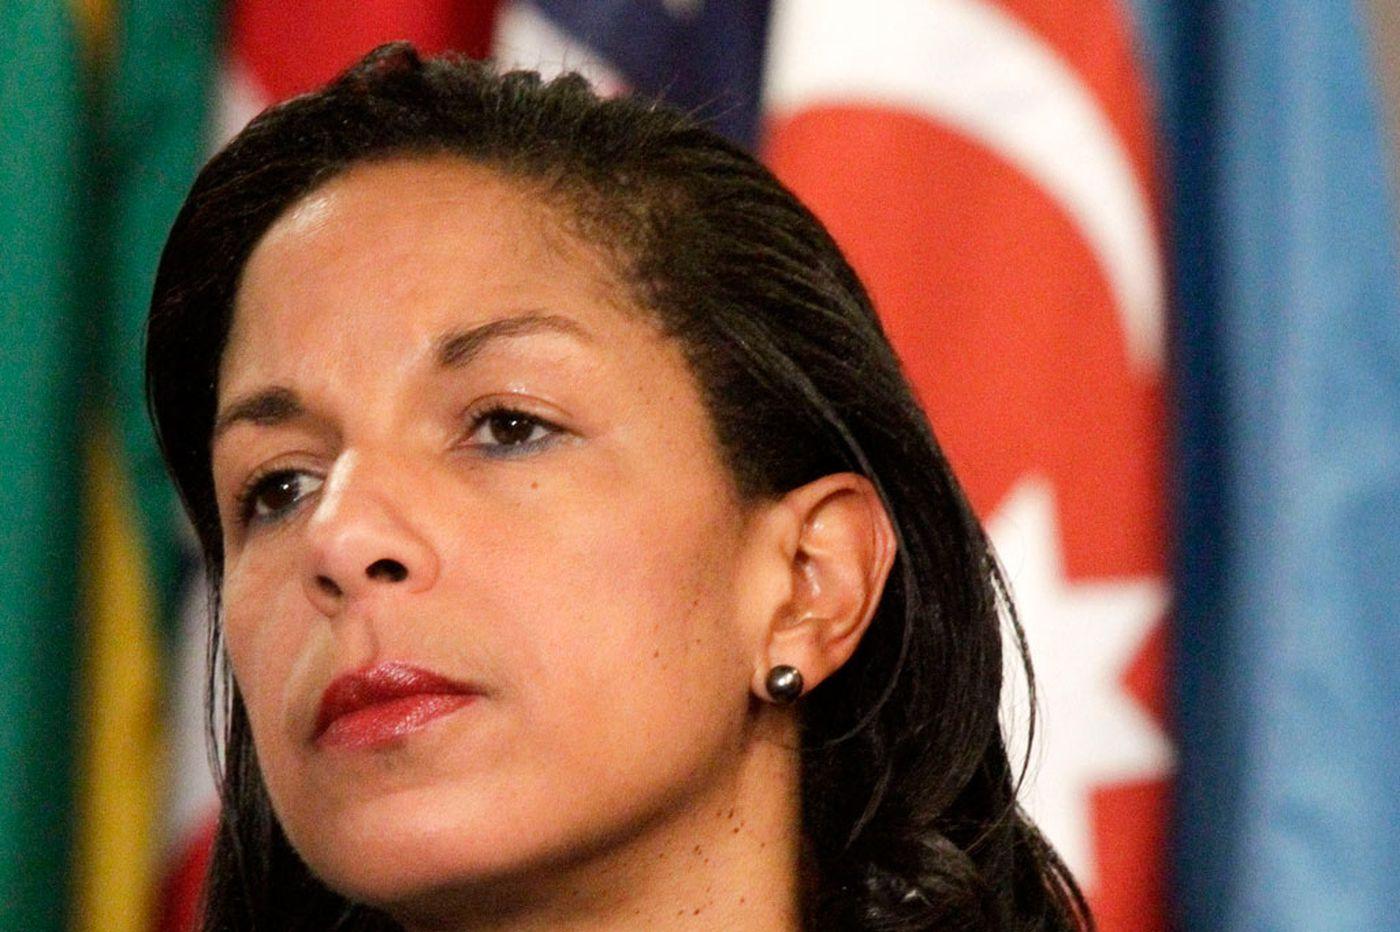 Political overtones in e-mails on Libya